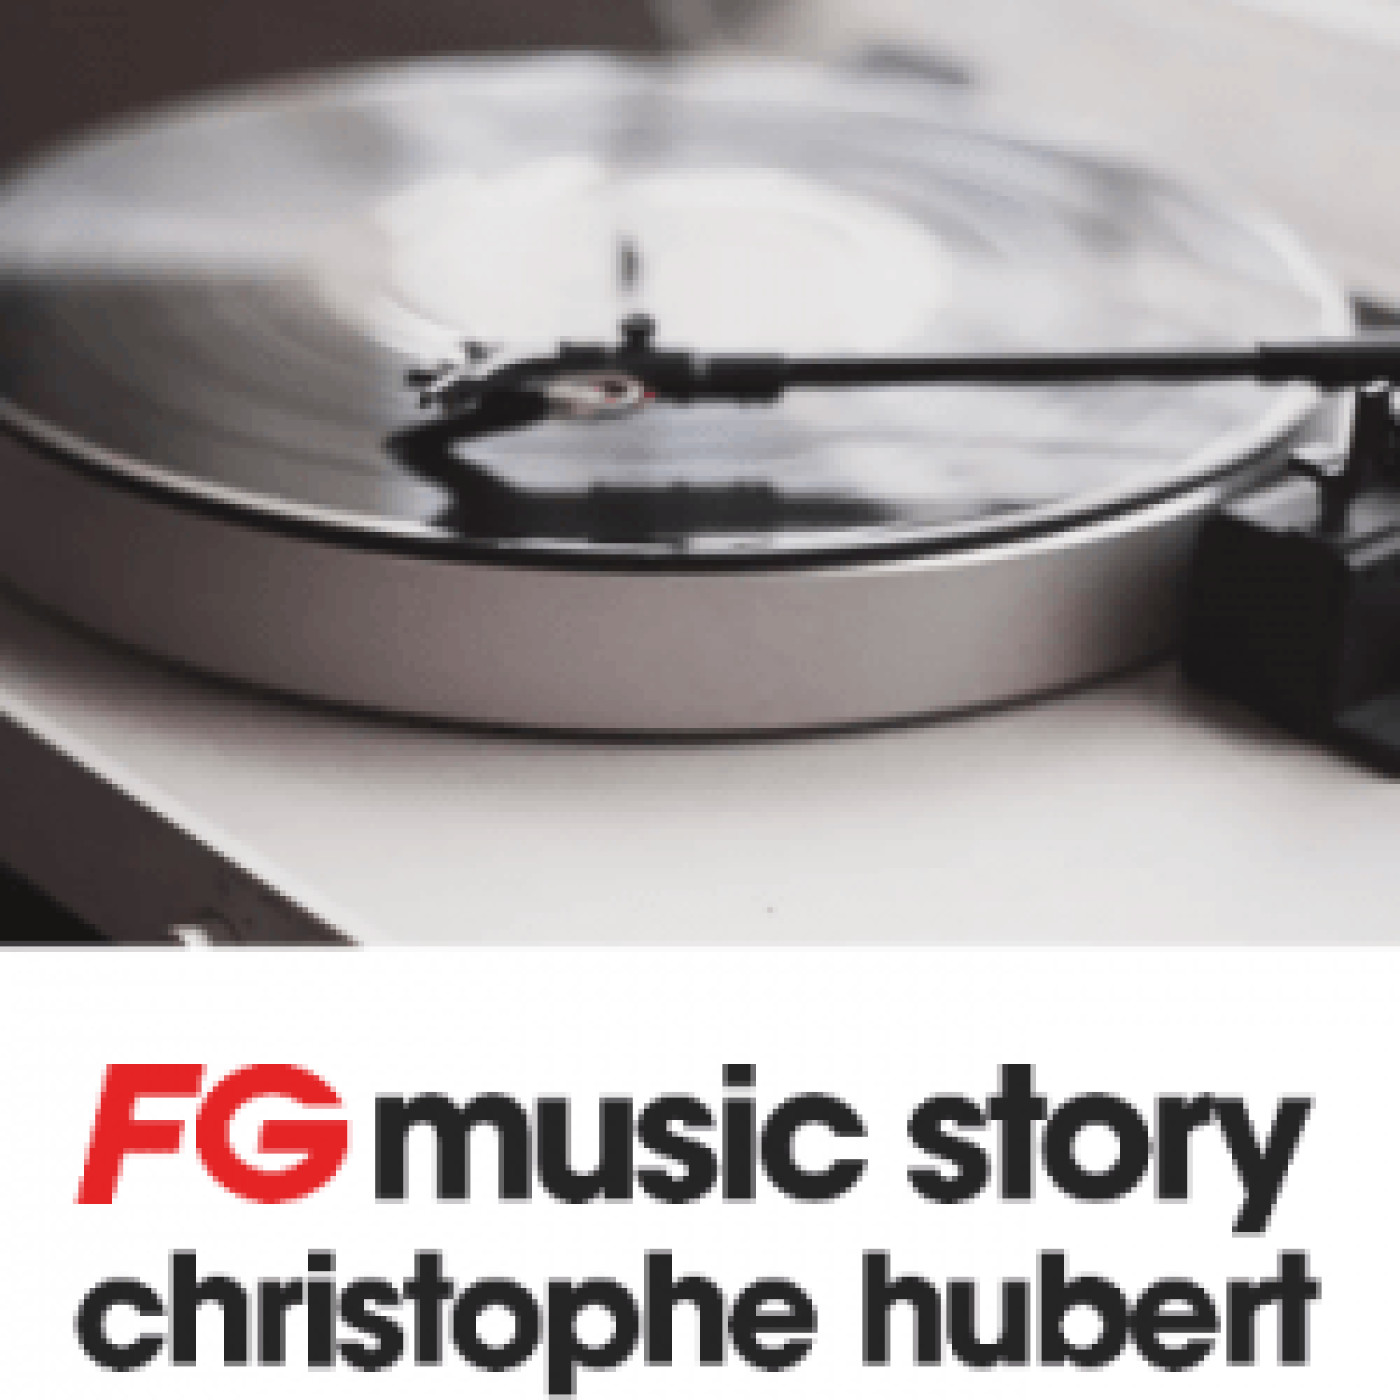 FG MUSIC STORY : LOUD LUXURY